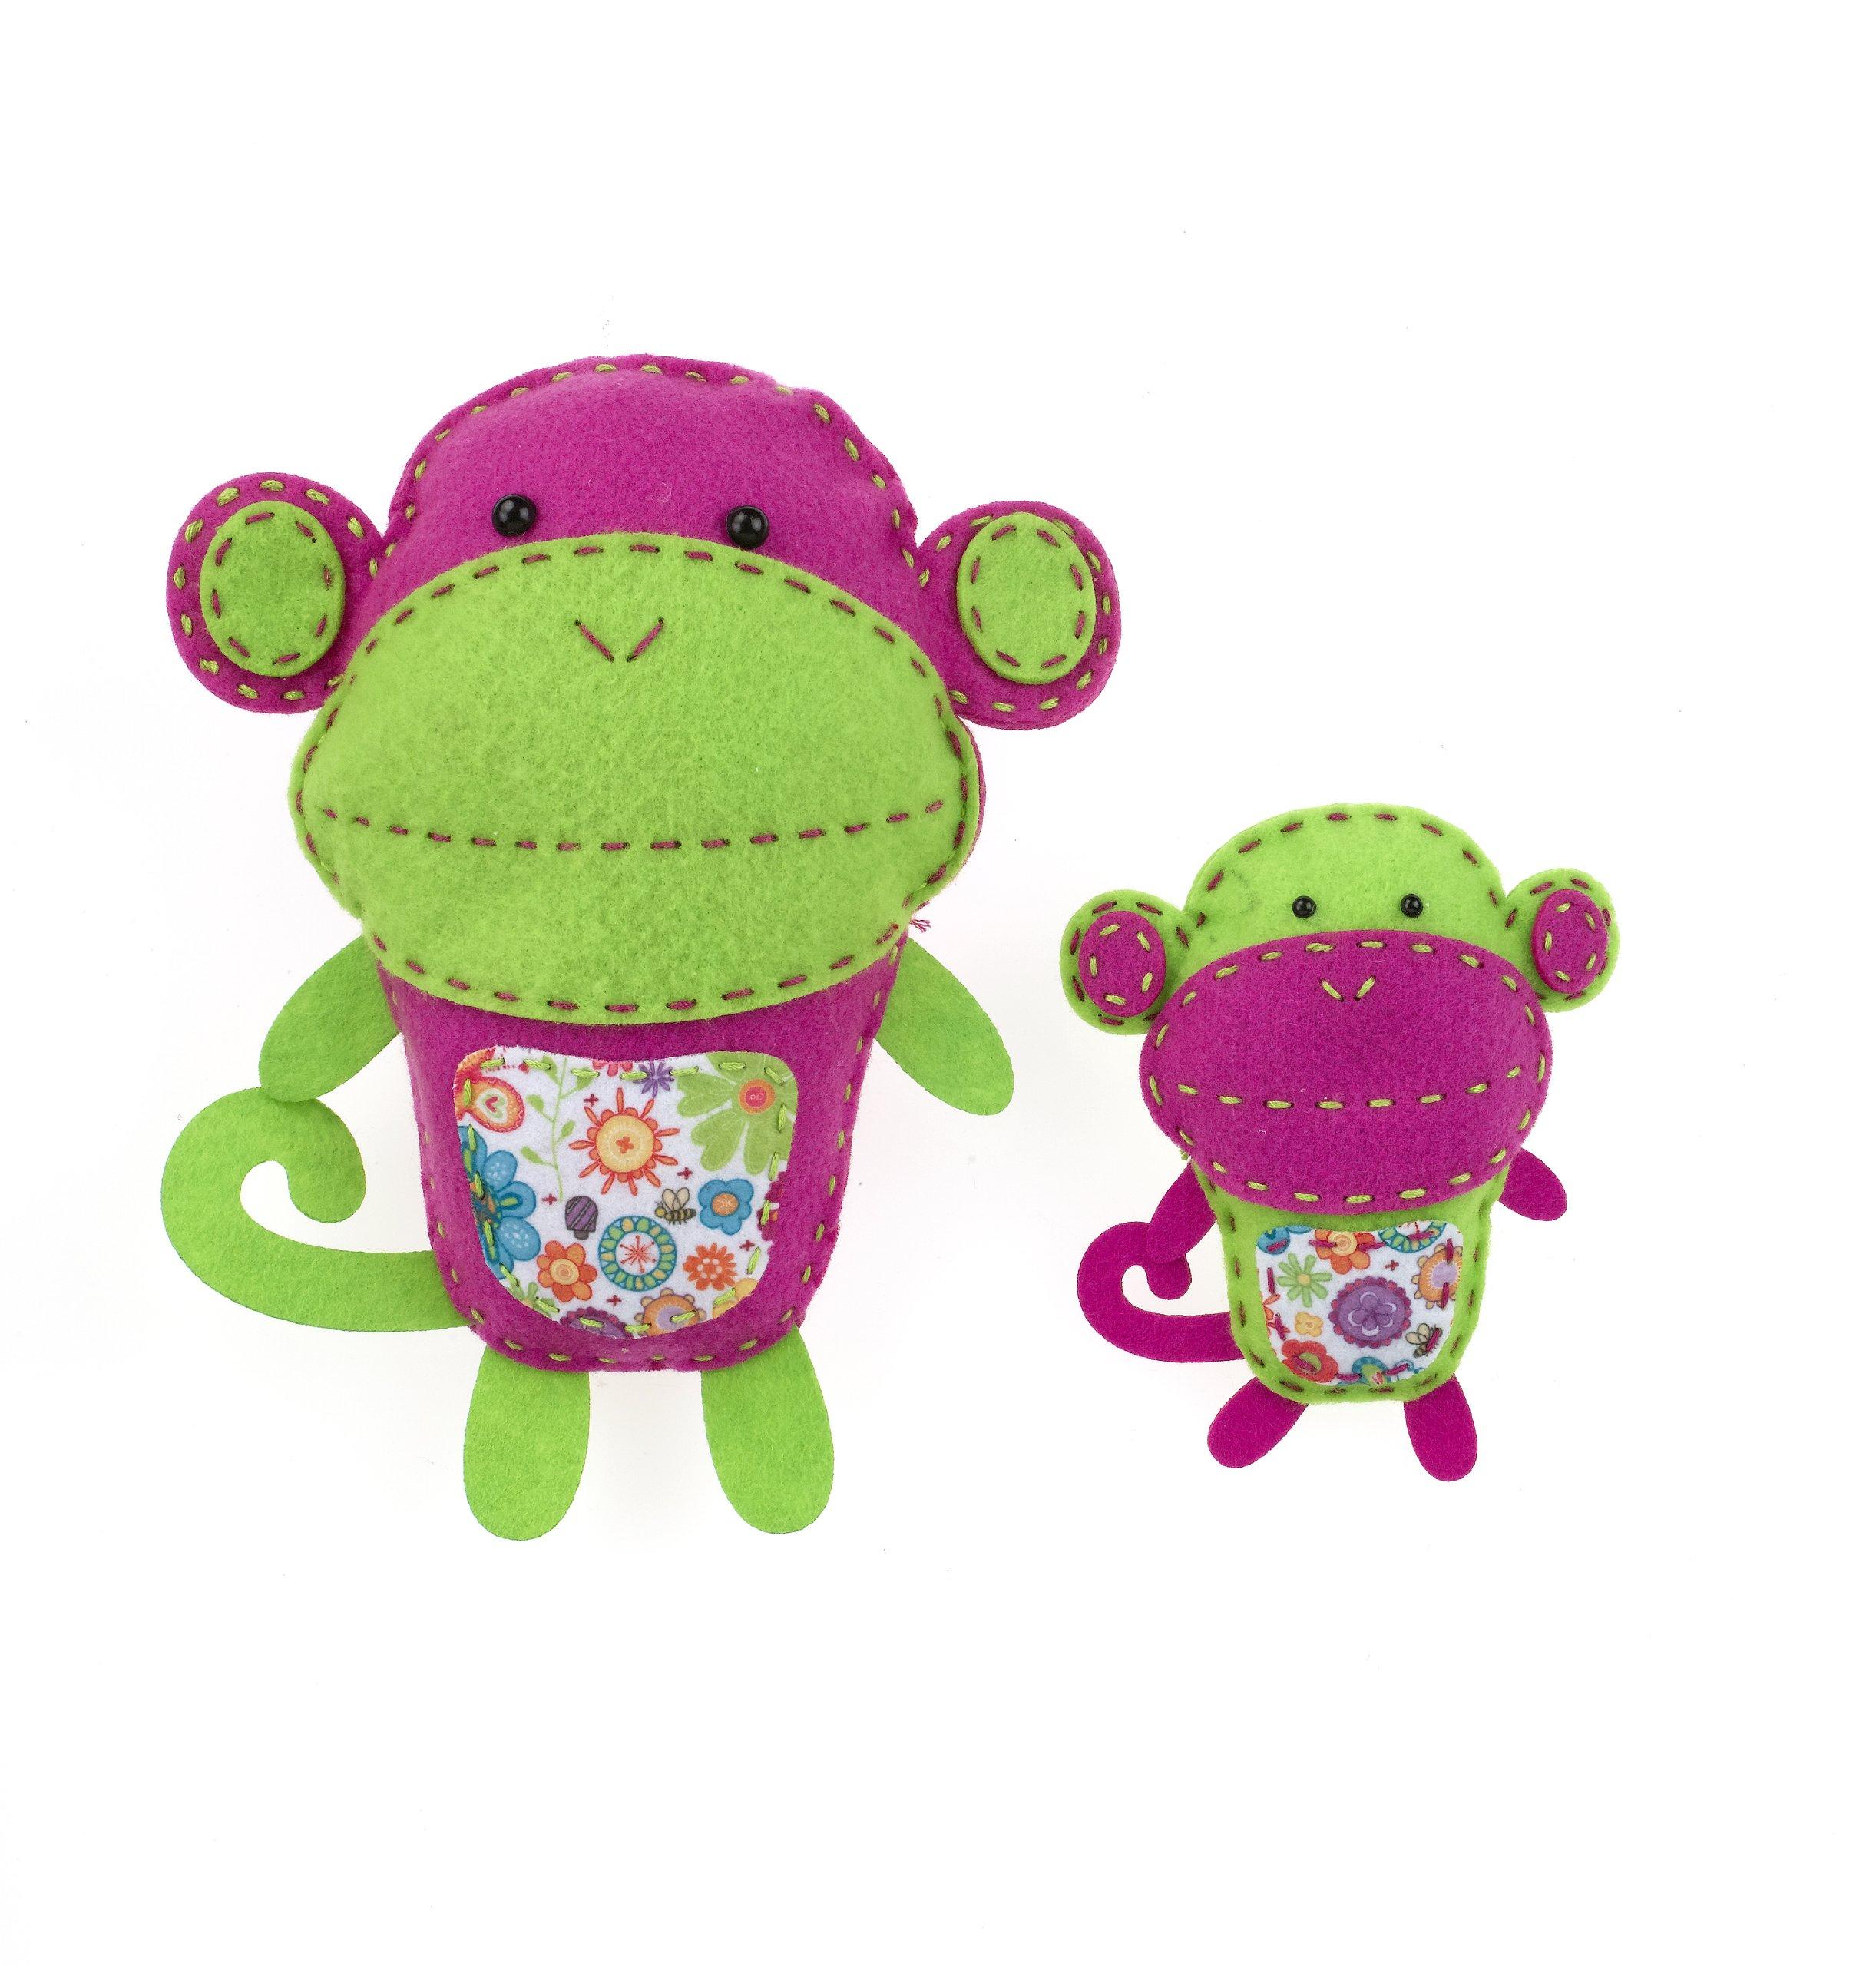 American Girl Crafts Monkeys Sew and Stuff Kit